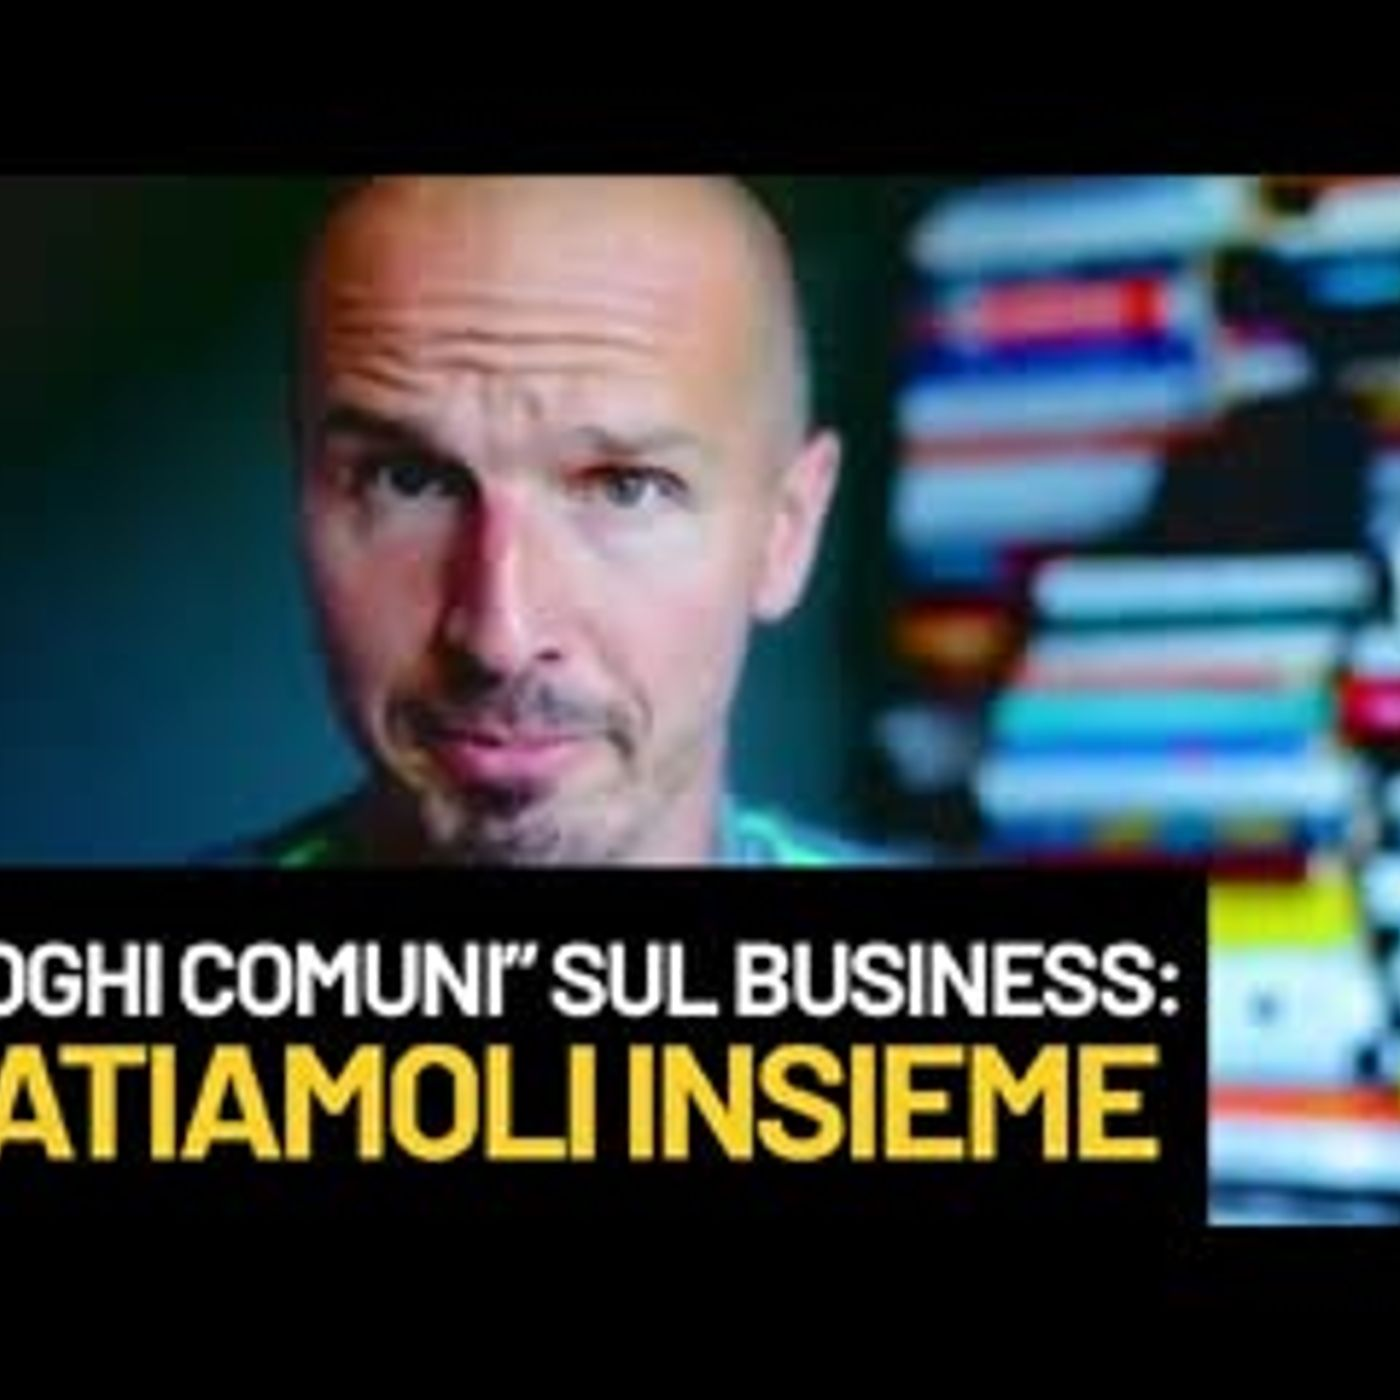 """Luoghi comuni"" sul business: sfatiamoli insieme"